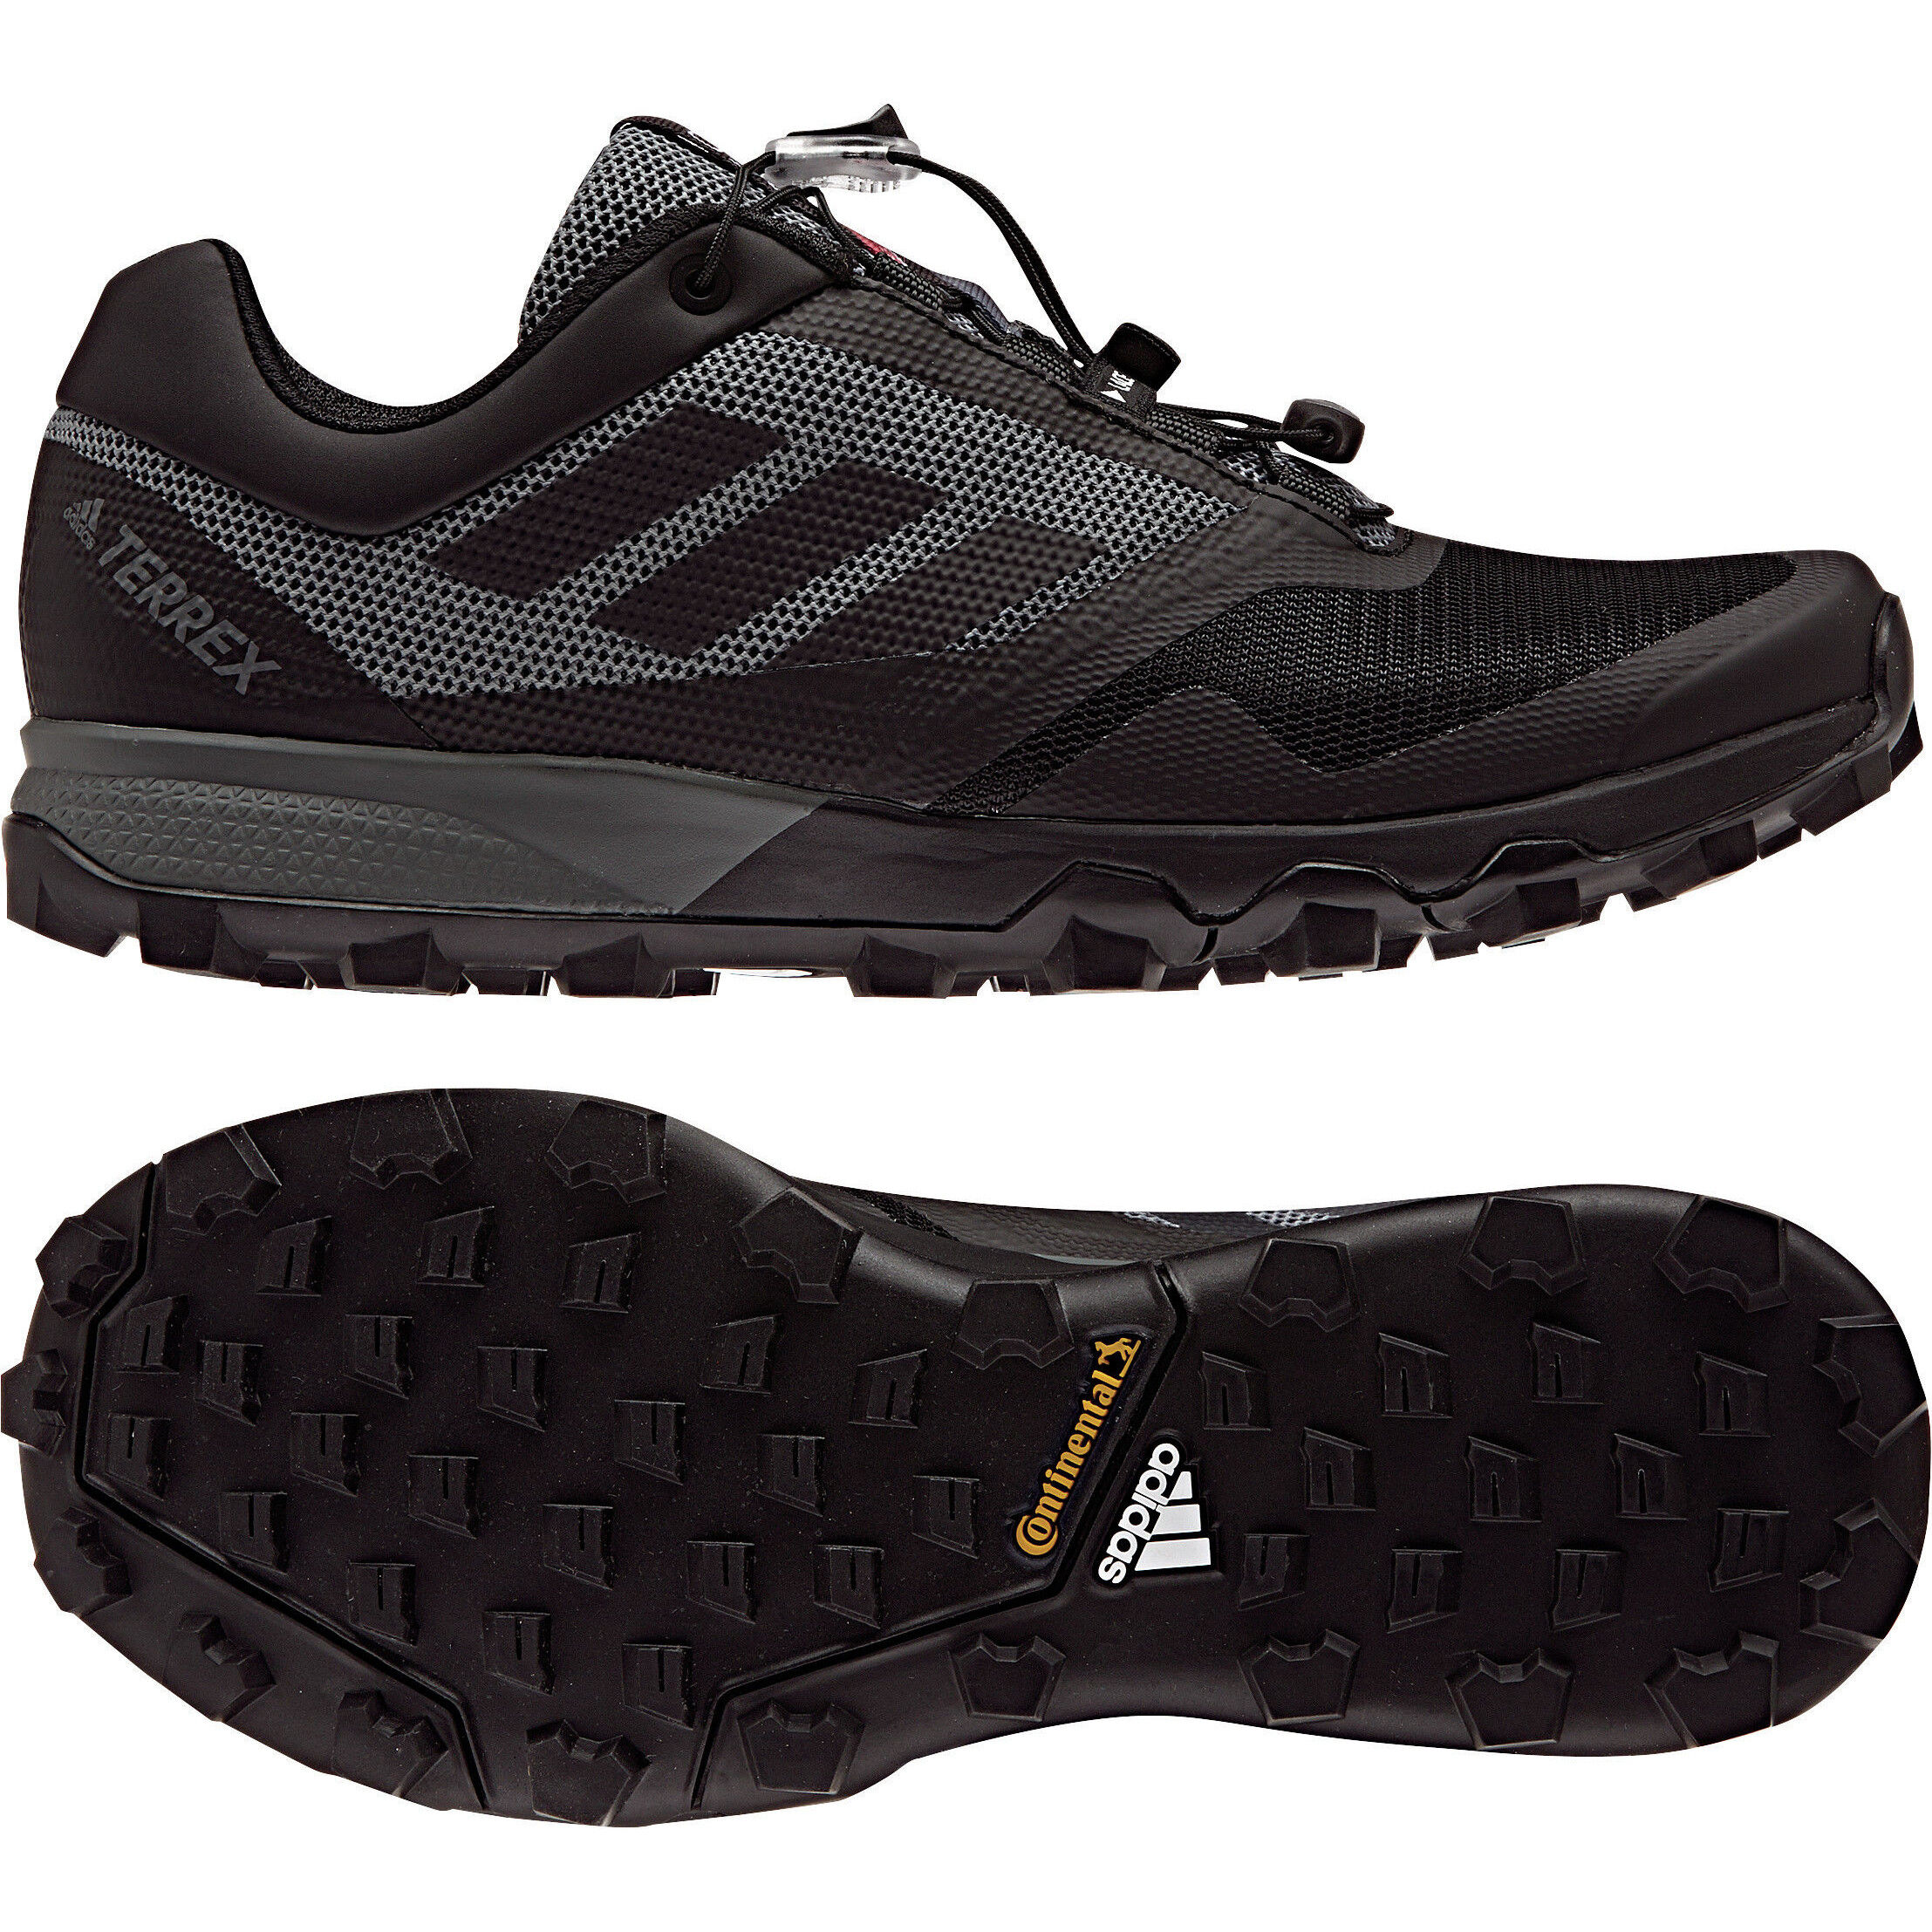 adidas TERREX Trailmaker Shoes Damen vista greycore blacktactile pink